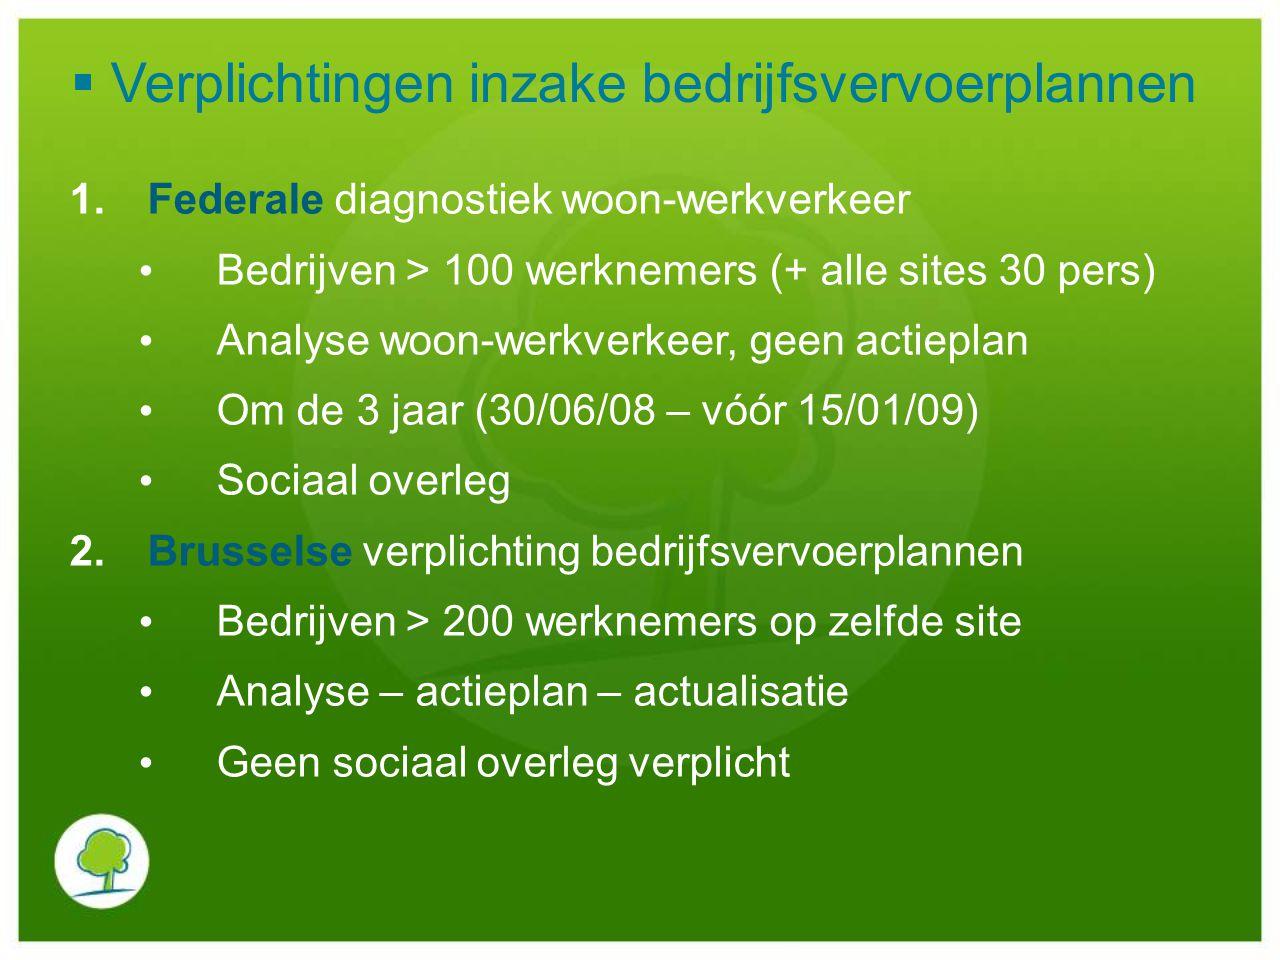 1.Federale diagnostiek woon-werkverkeer Bedrijven > 100 werknemers (+ alle sites 30 pers) Analyse woon-werkverkeer, geen actieplan Om de 3 jaar (30/06